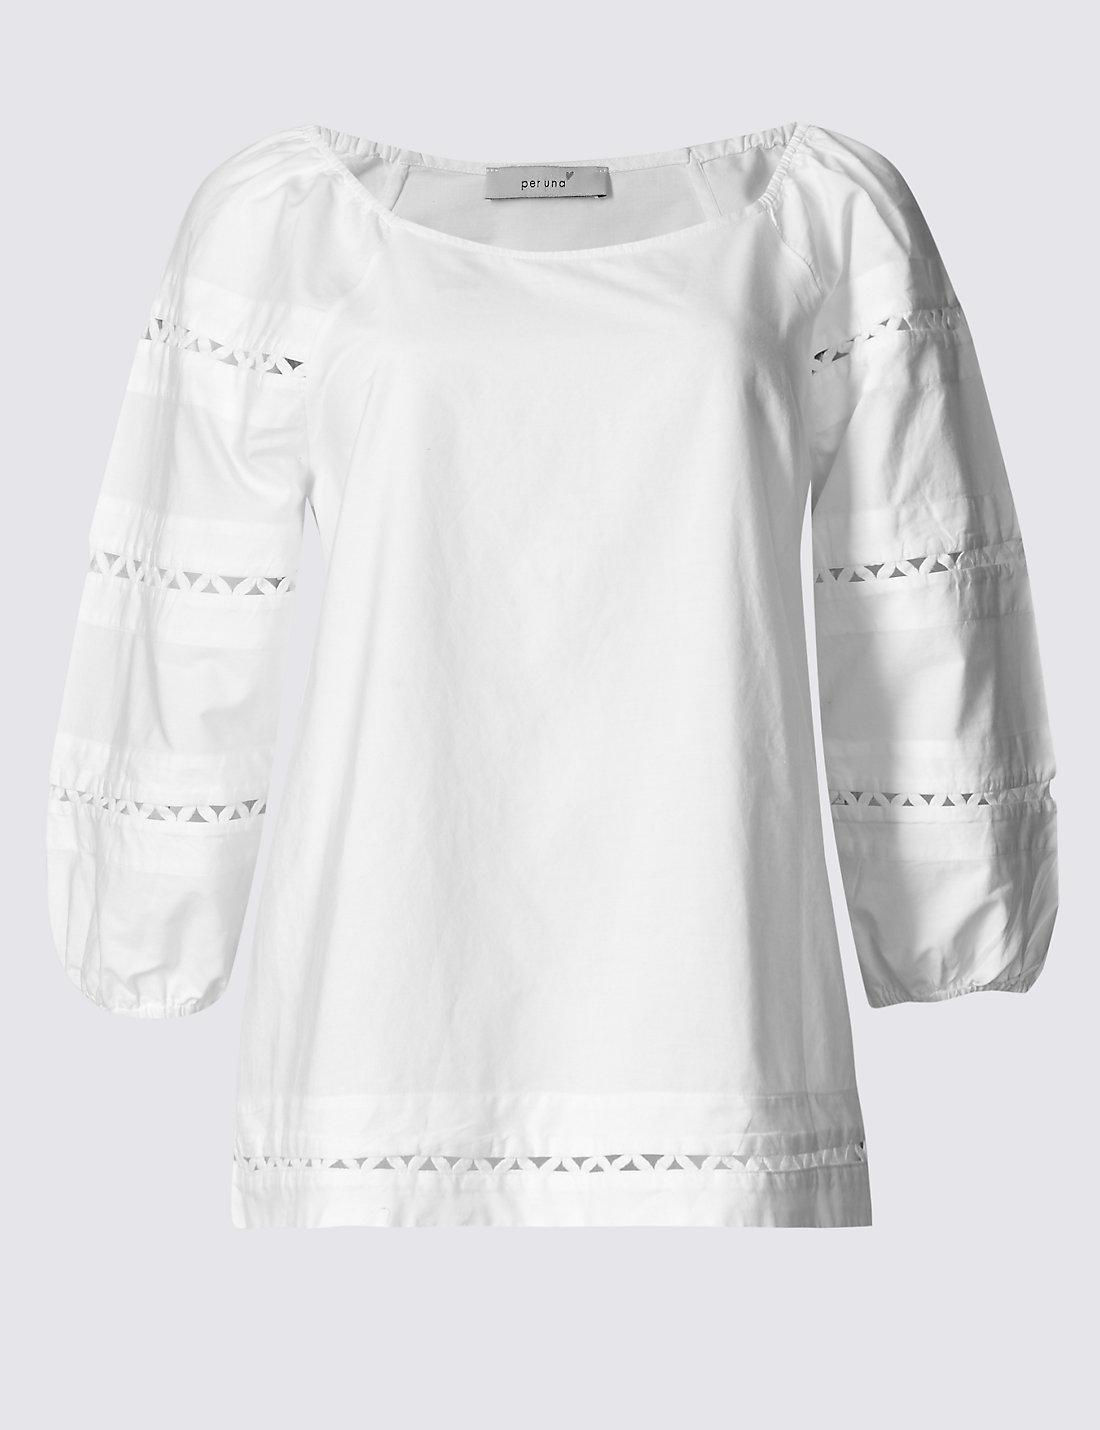 white stitch top